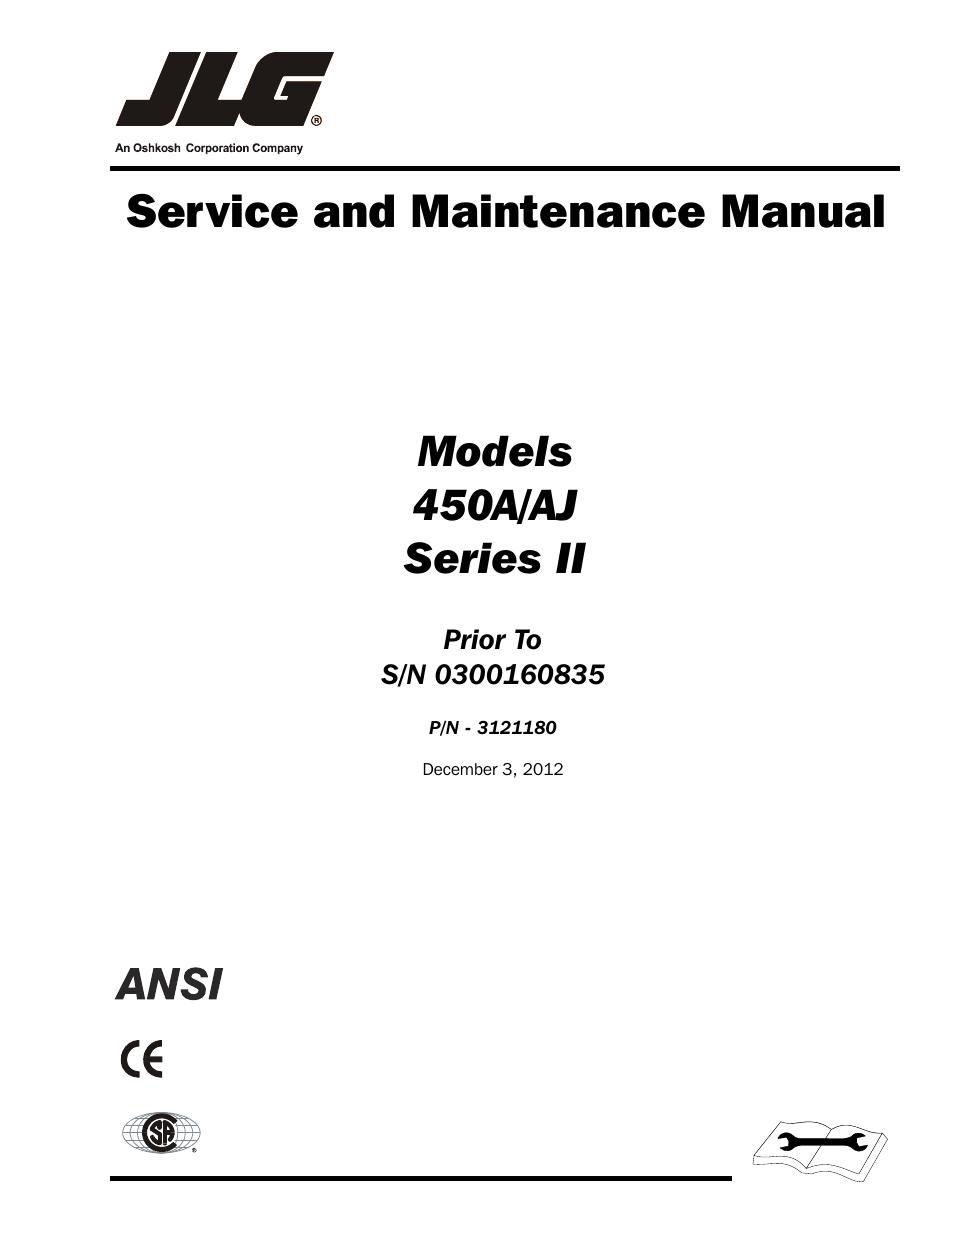 Aermacchi service manual